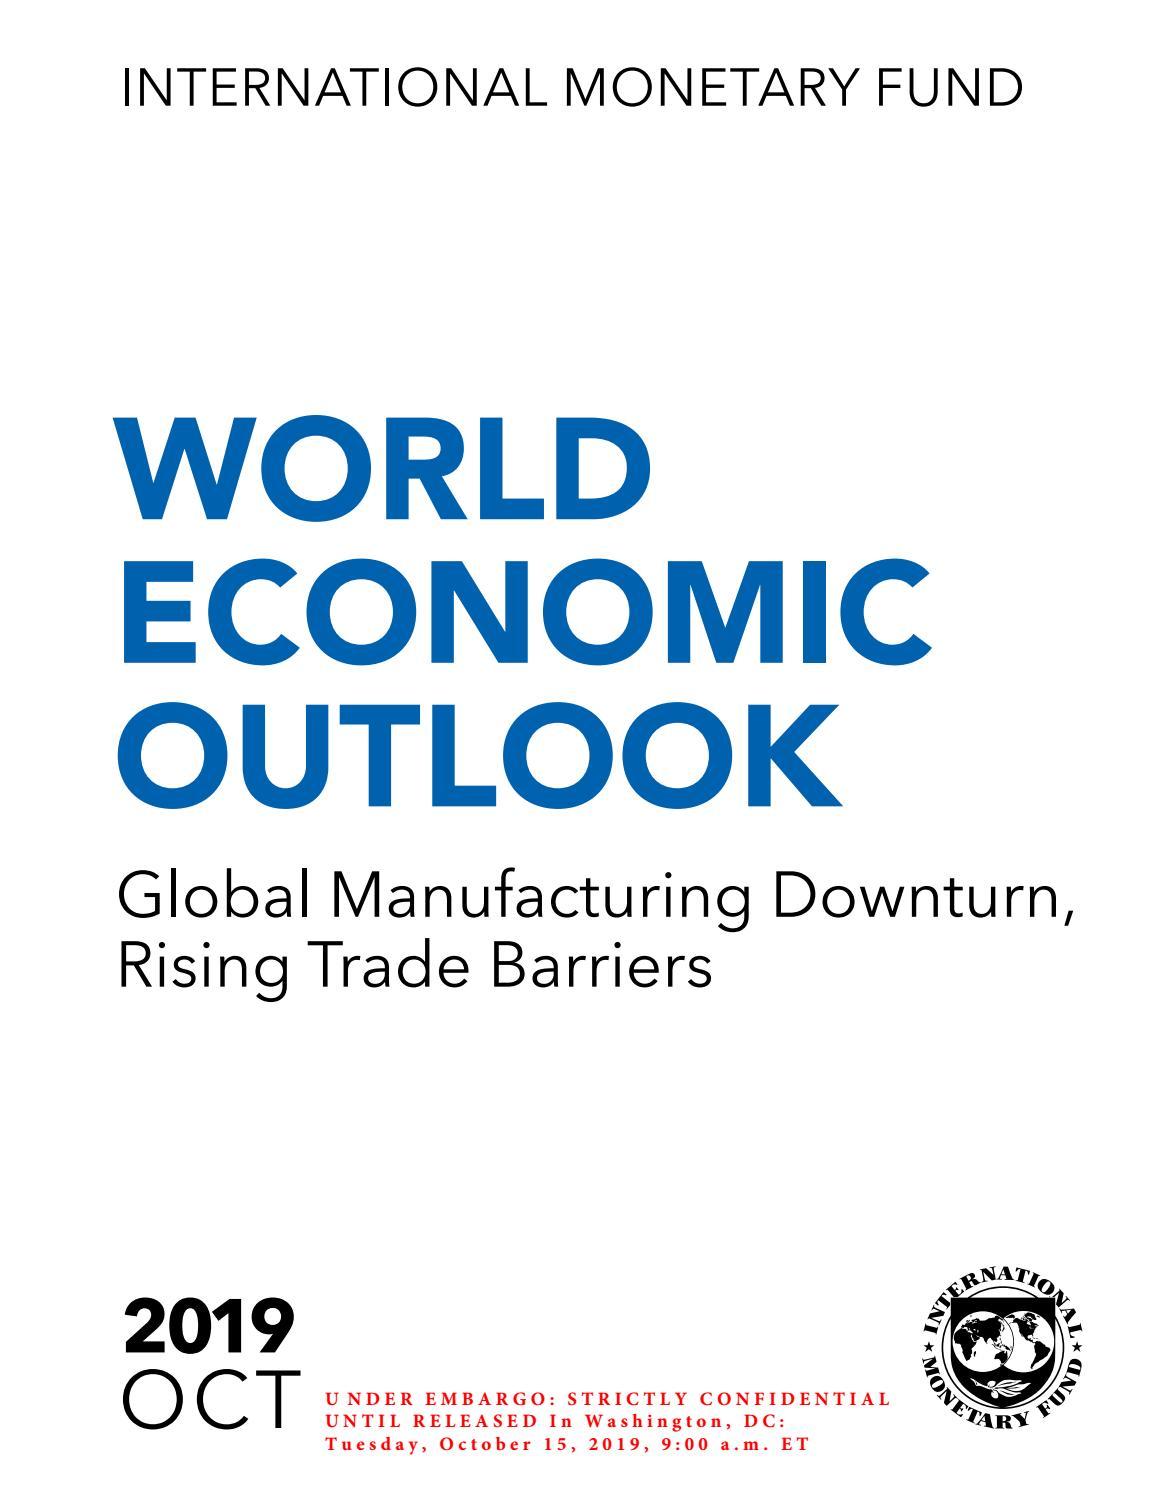 Imf World Economic Outlook By Efhmerida Twn Syntaktwn Issuu